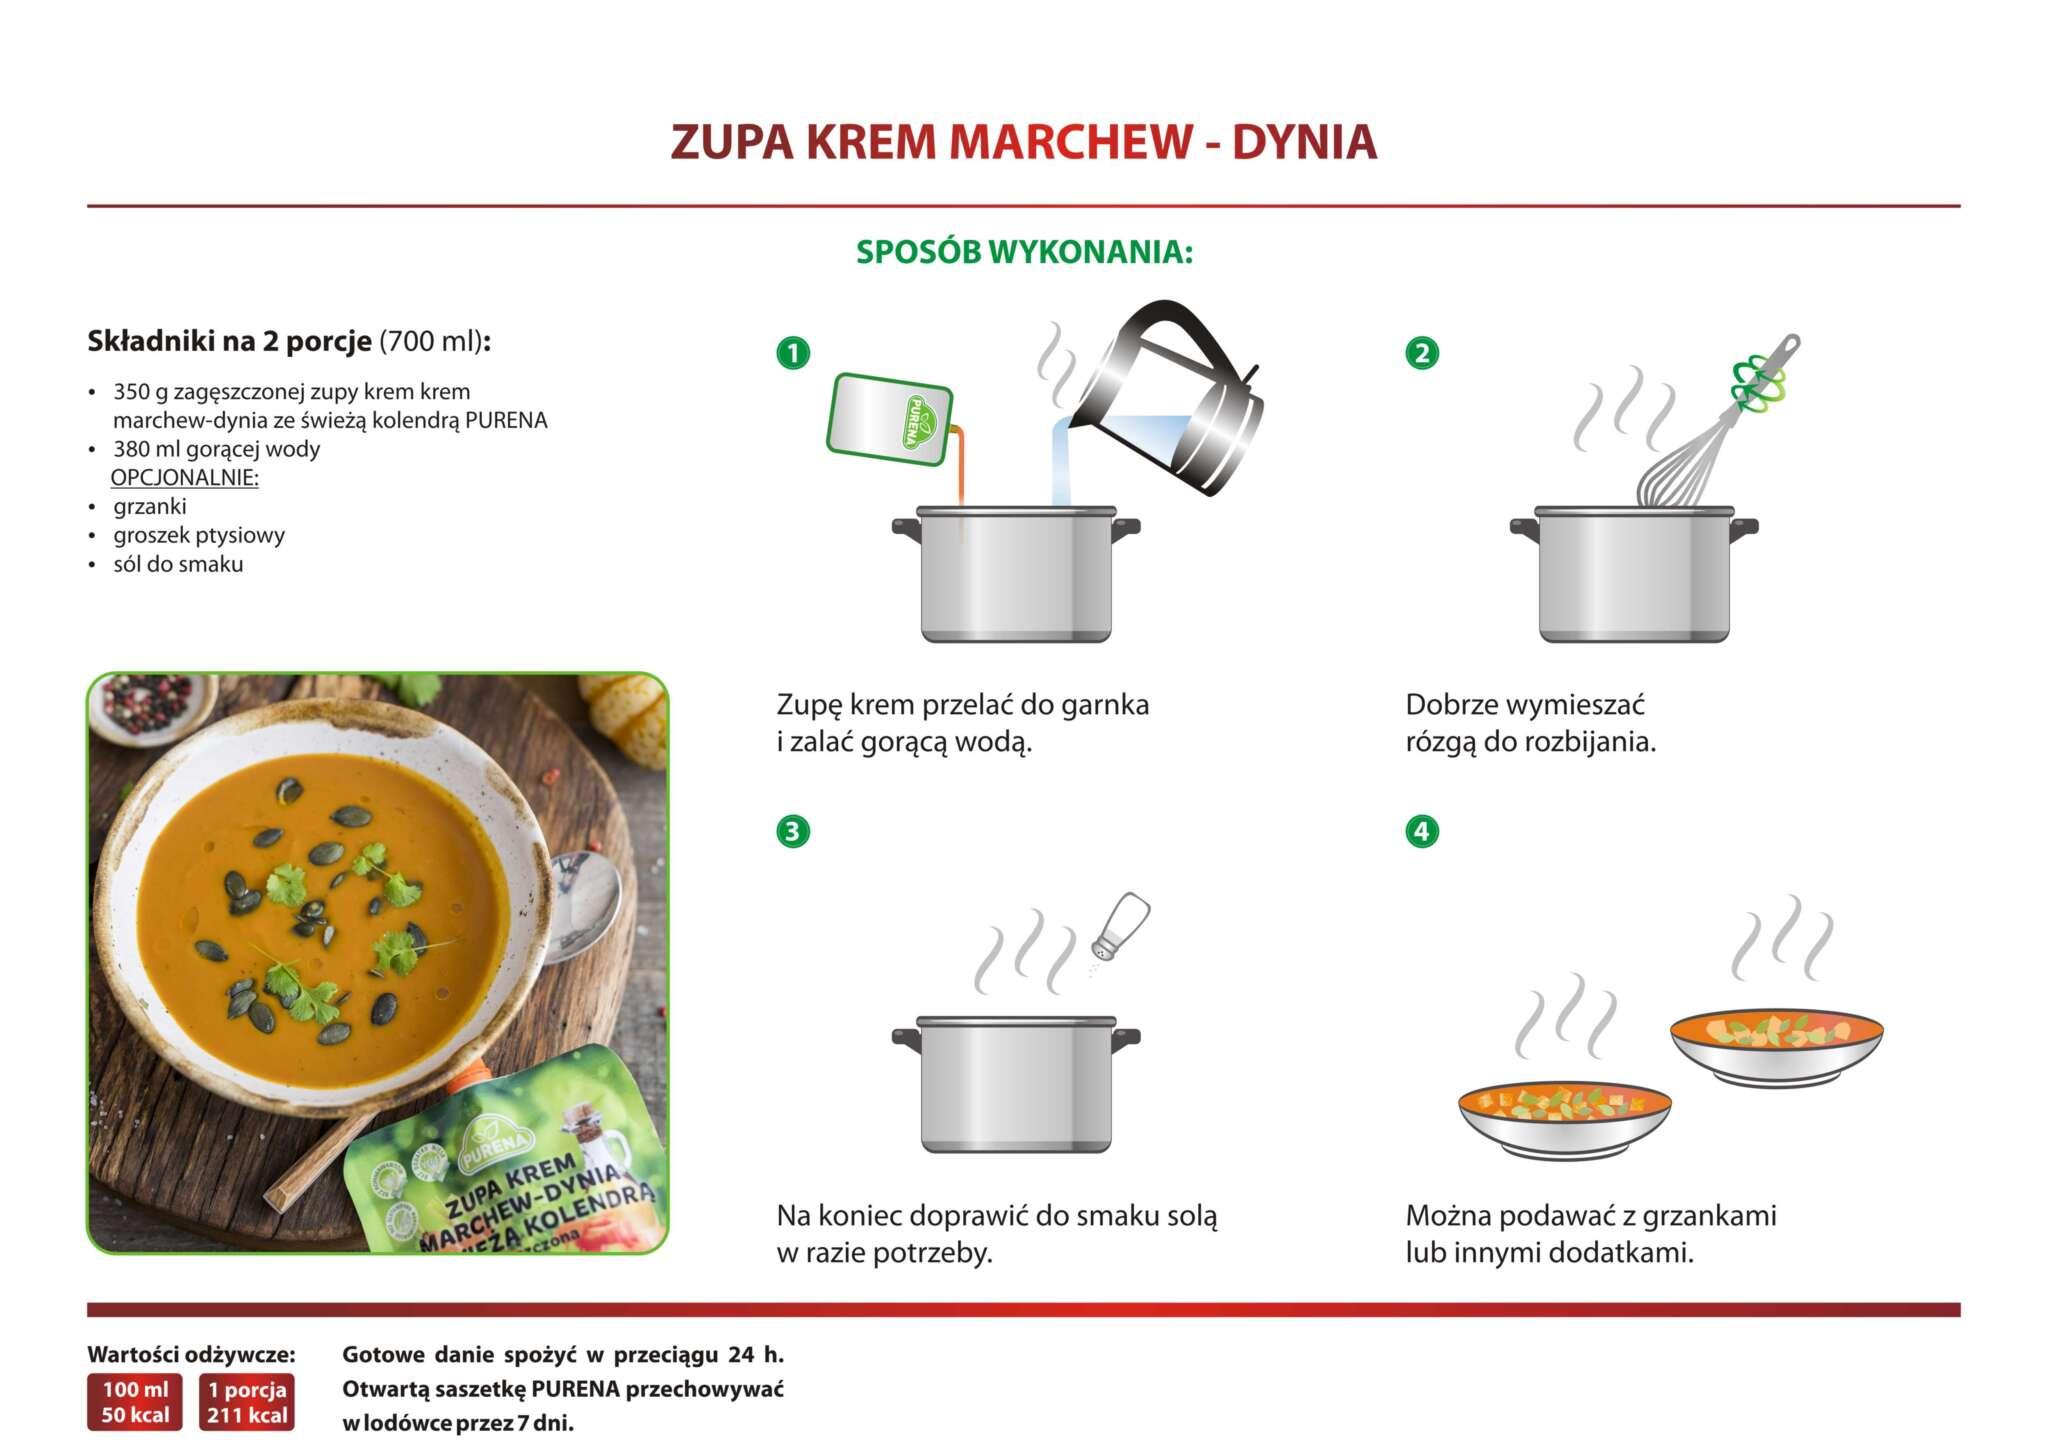 Zupa krem marchew-dynia